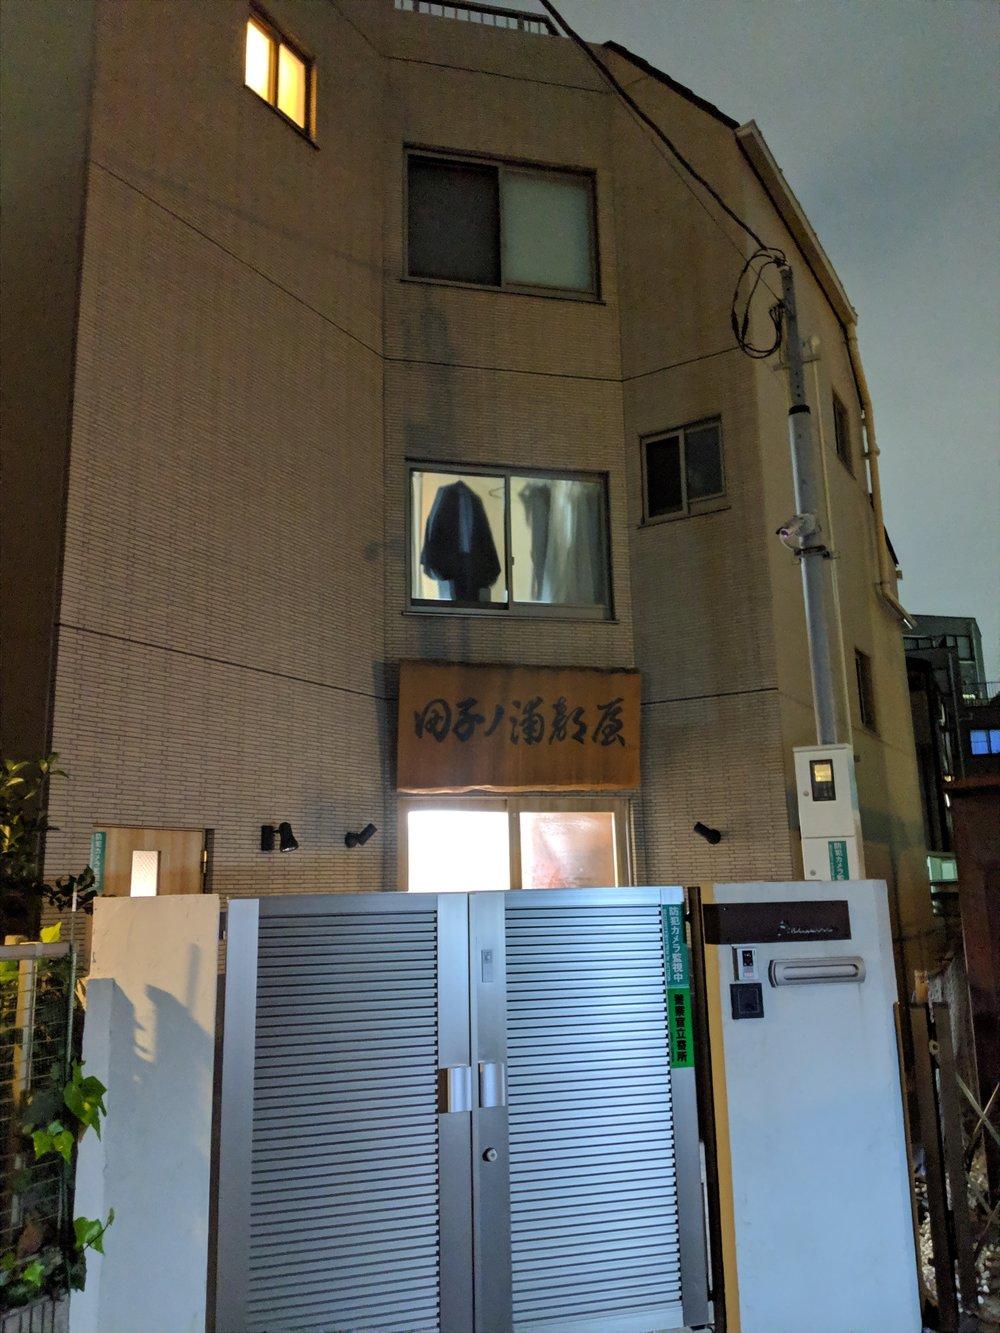 home of local Yokozuna in Chiba